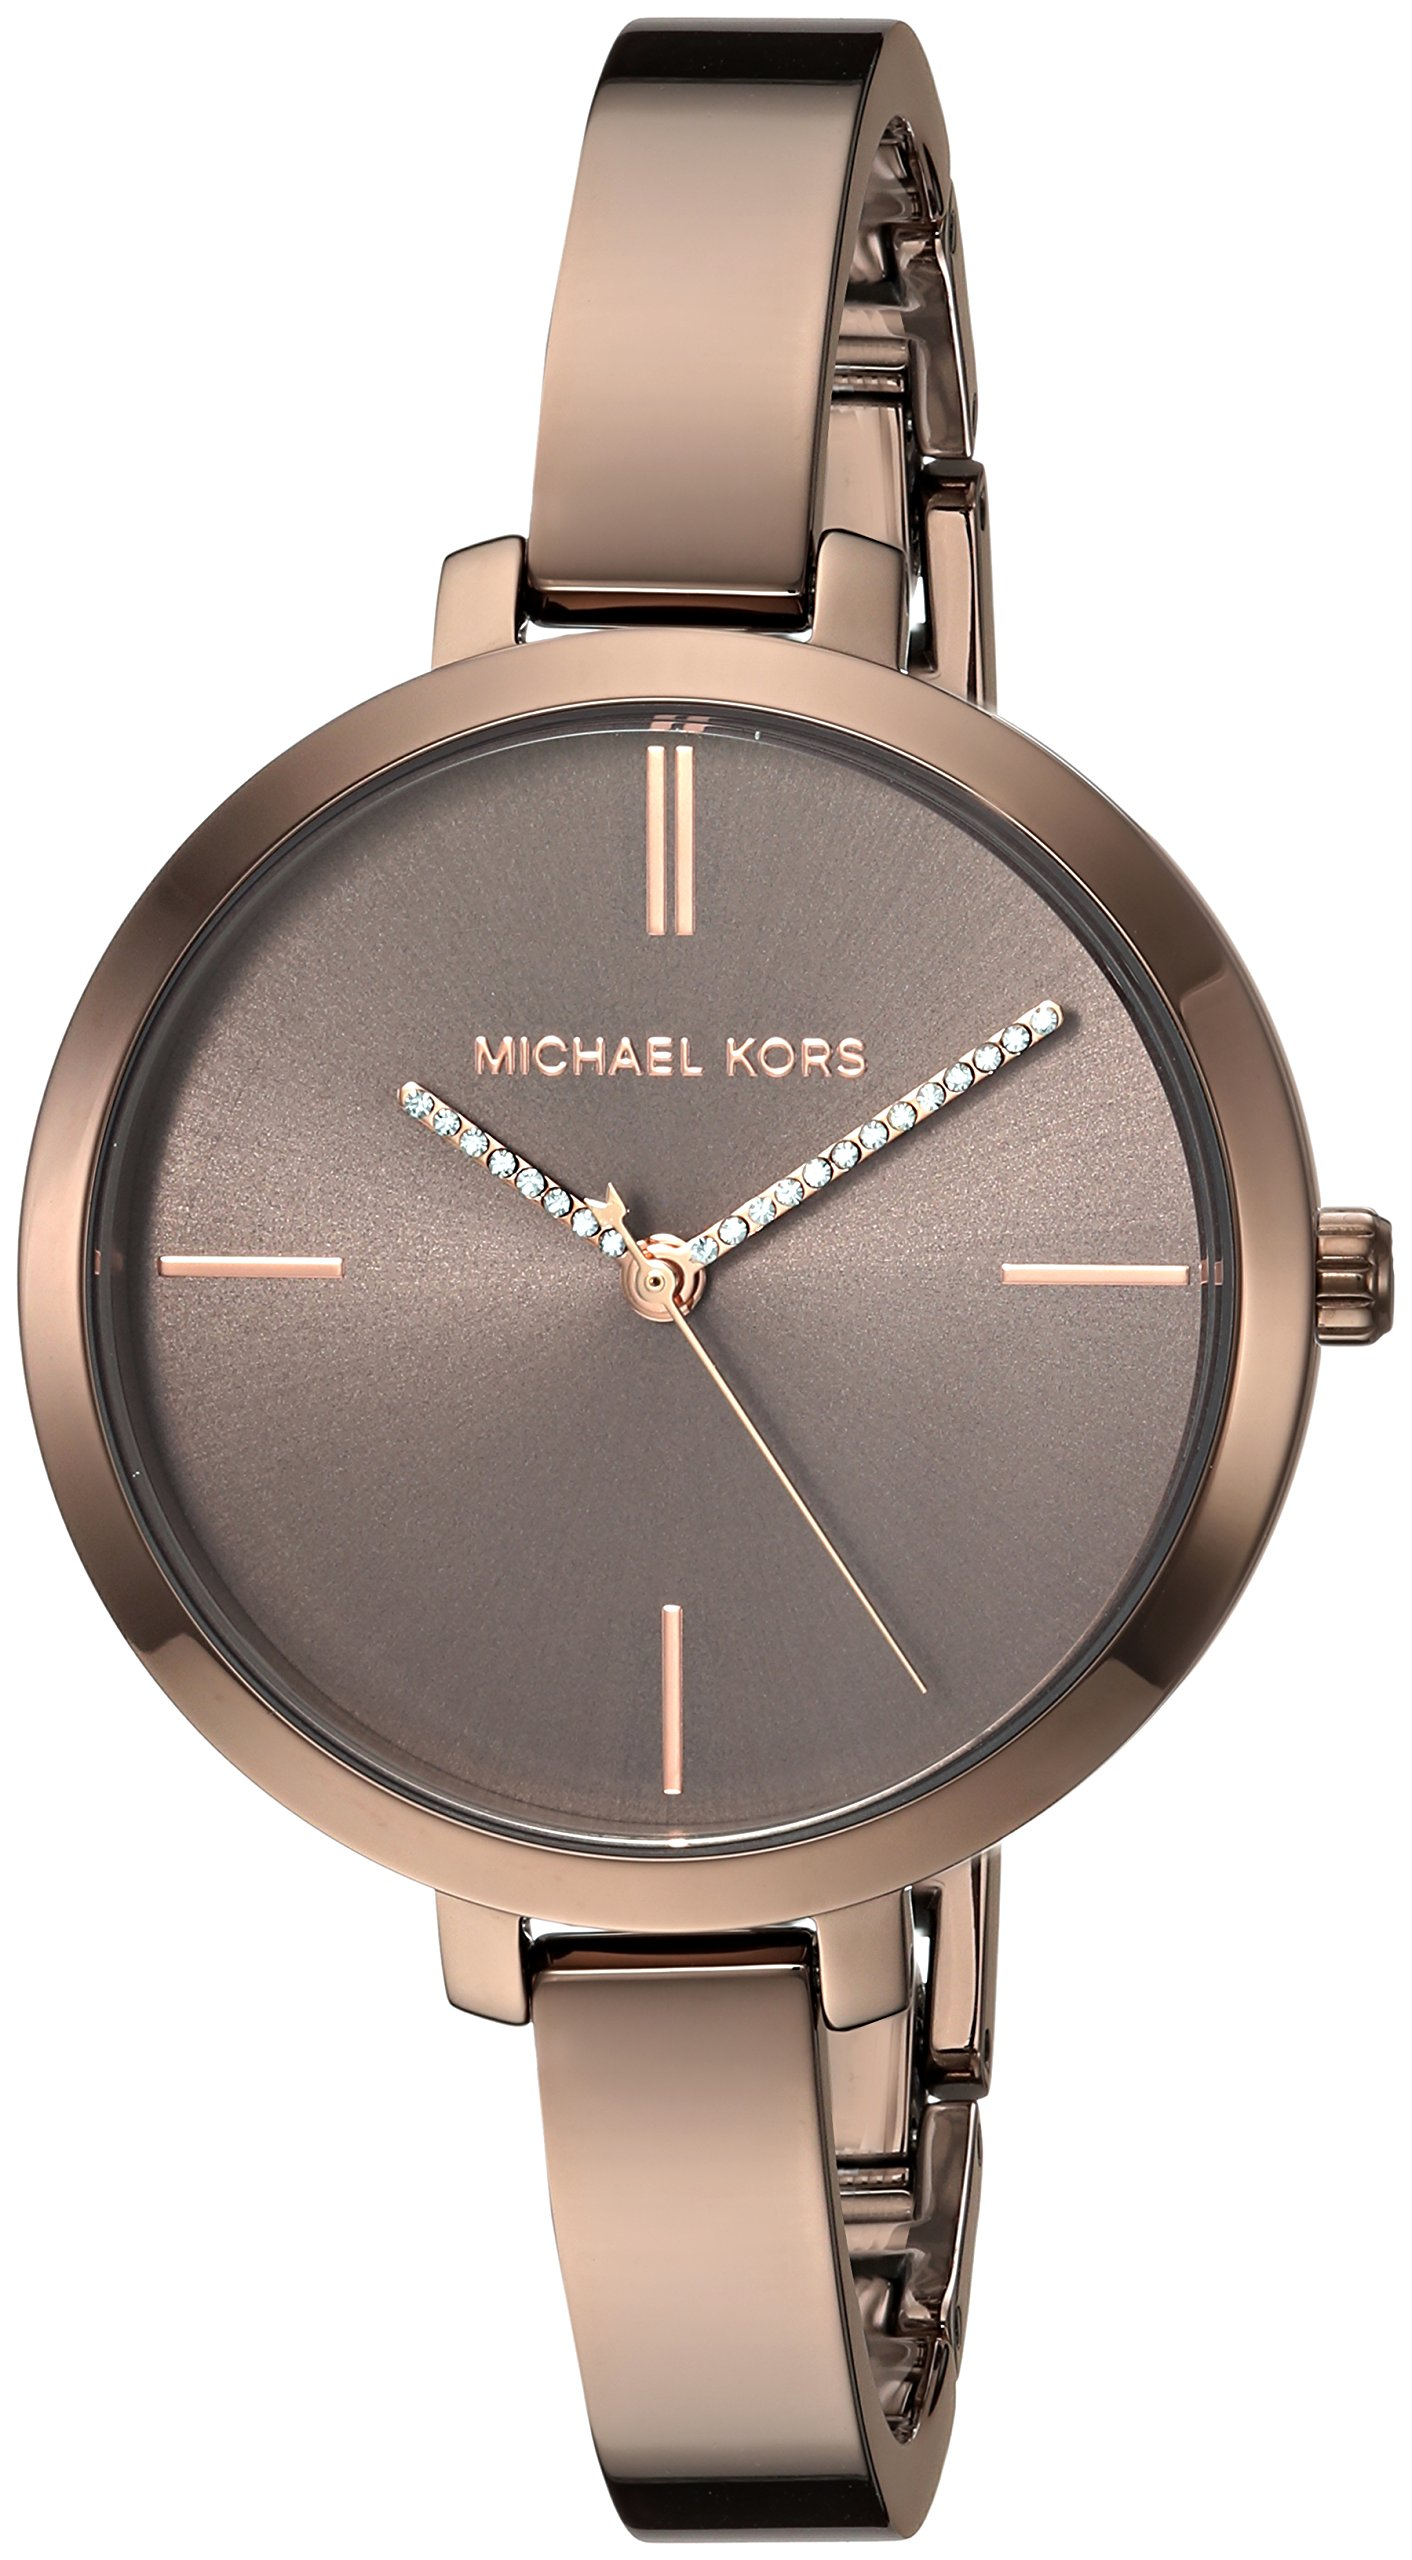 Michael Kors Women's 'Jaryn' Quartz Stainless Steel Casual Watch, Color:Brown (Model: MK3736)